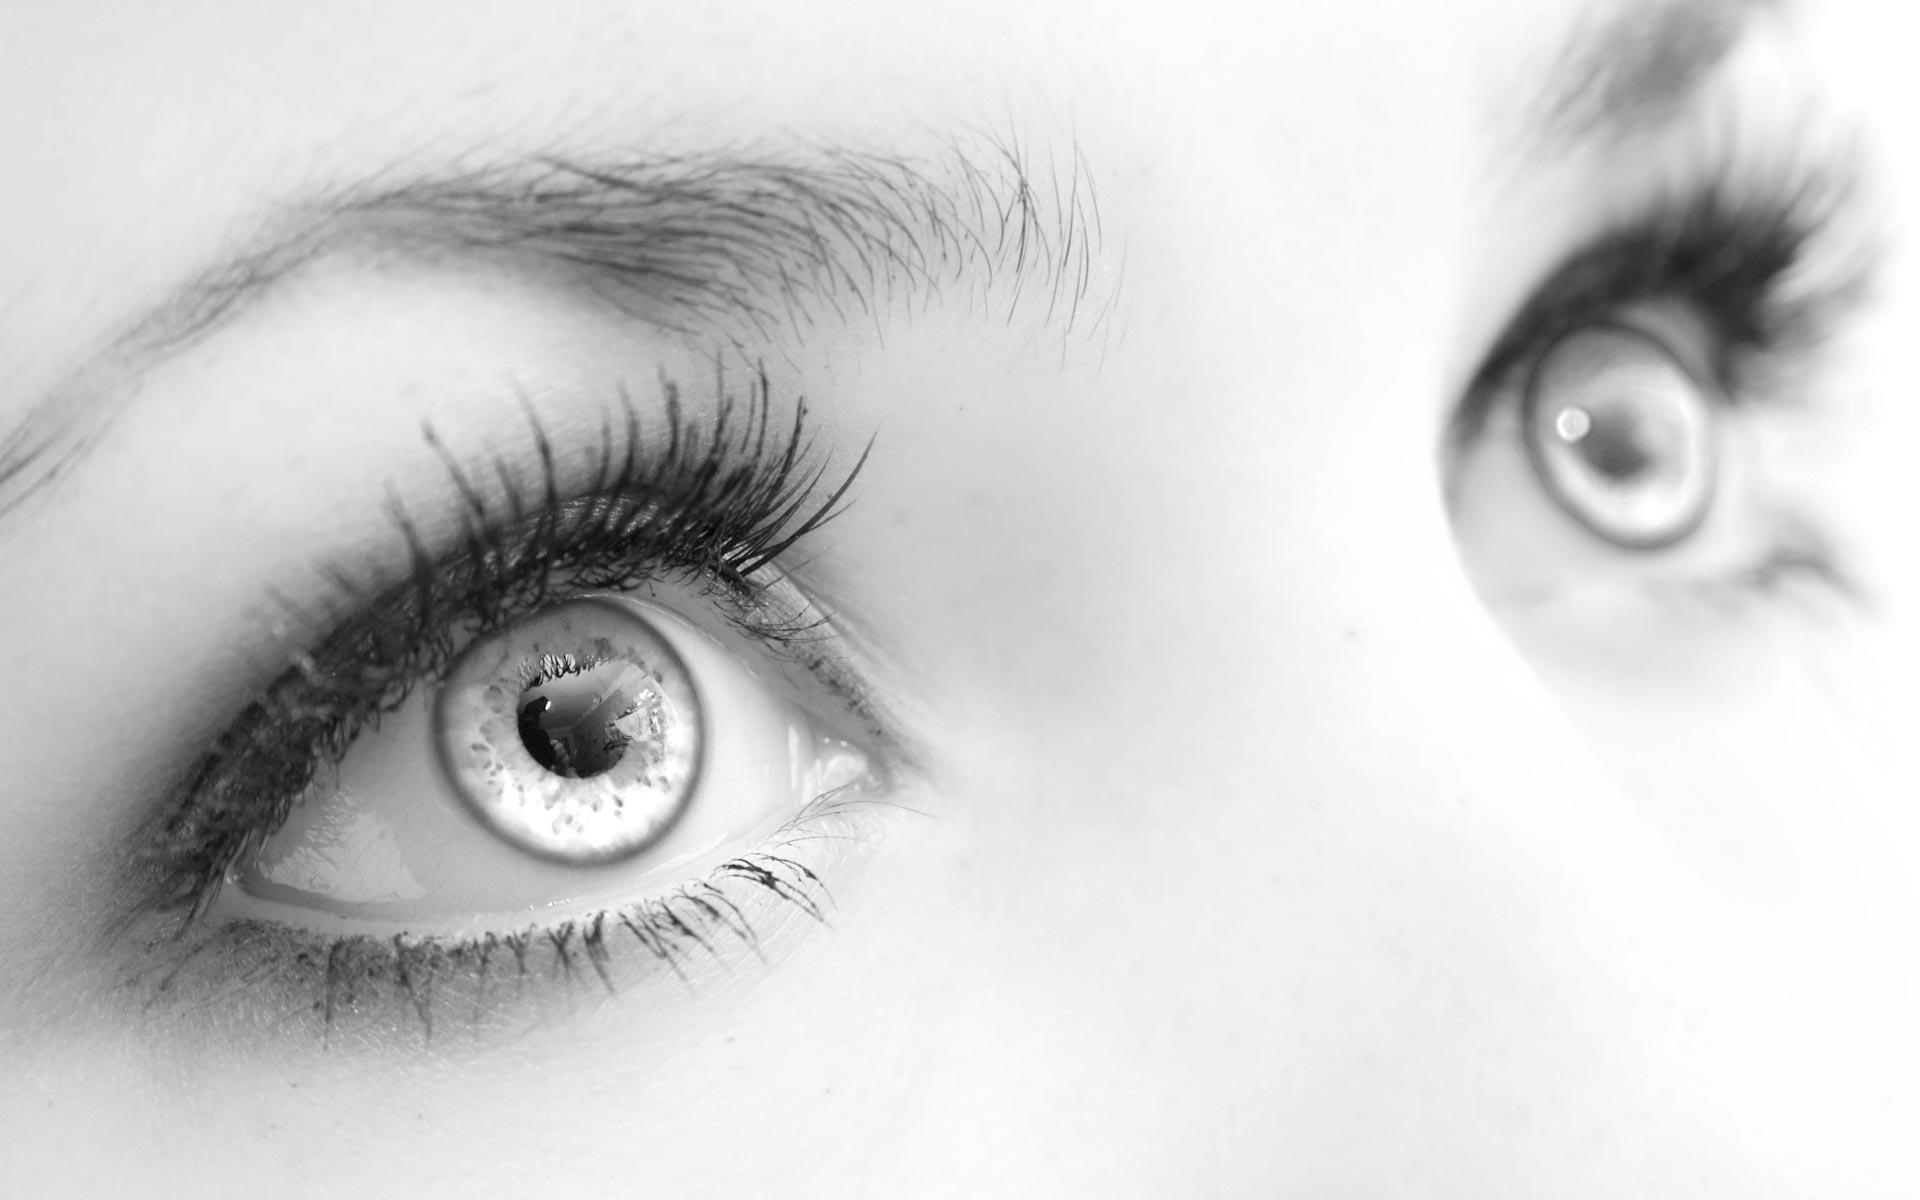 enfermedades oculares raras 8